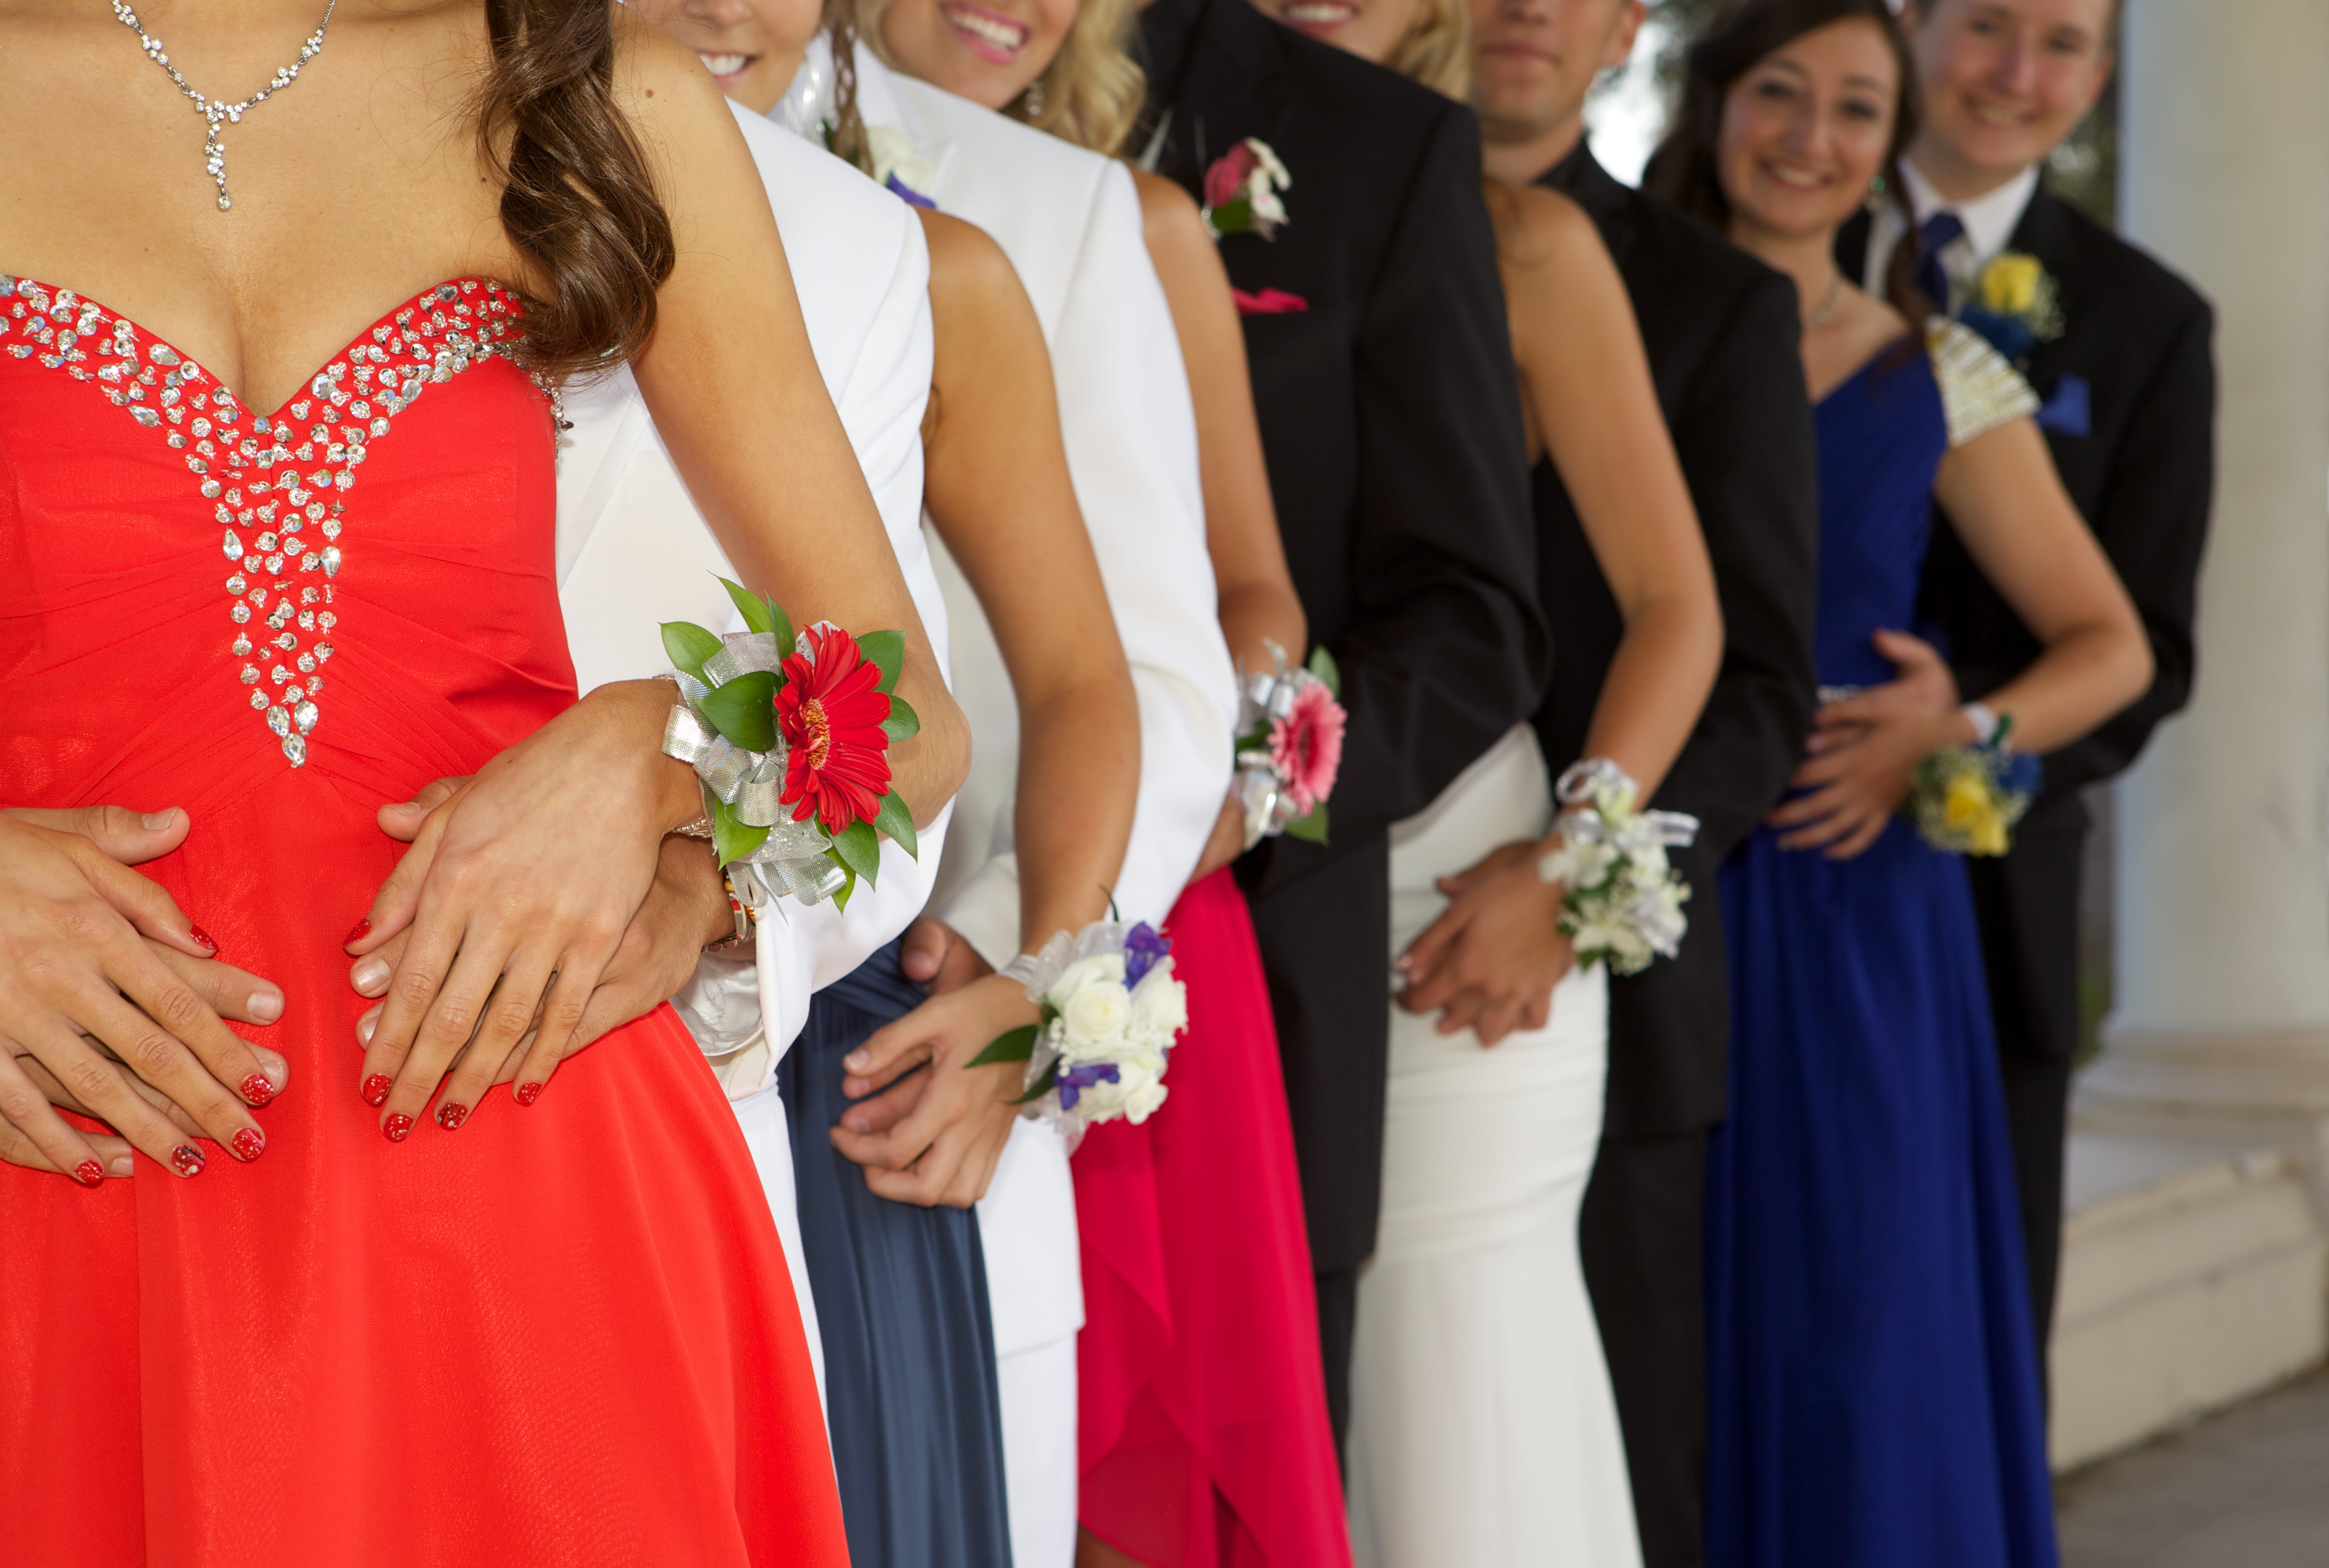 prom dresses kansas city on the plaza